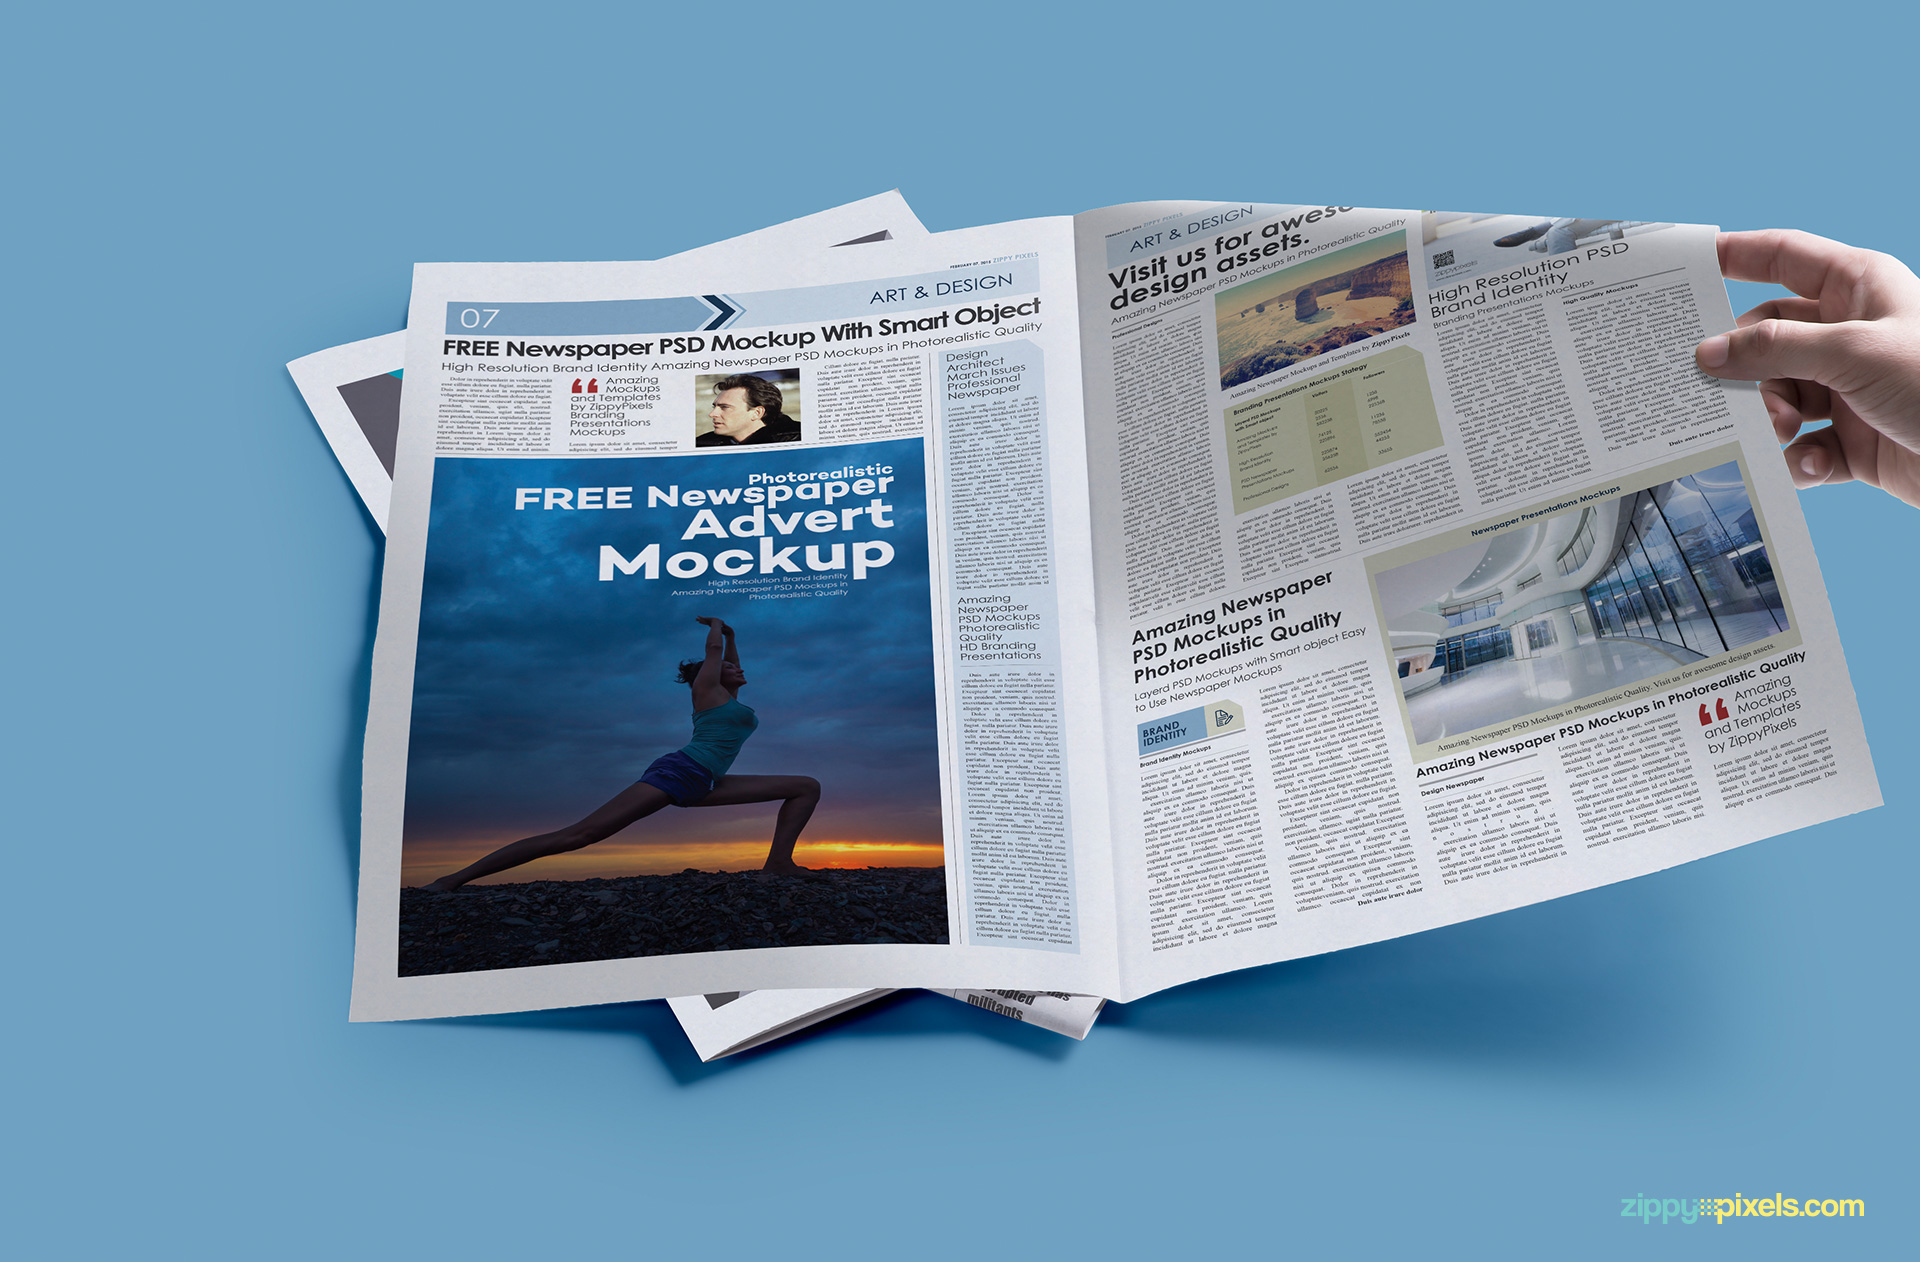 PSD of free print ad mockup.